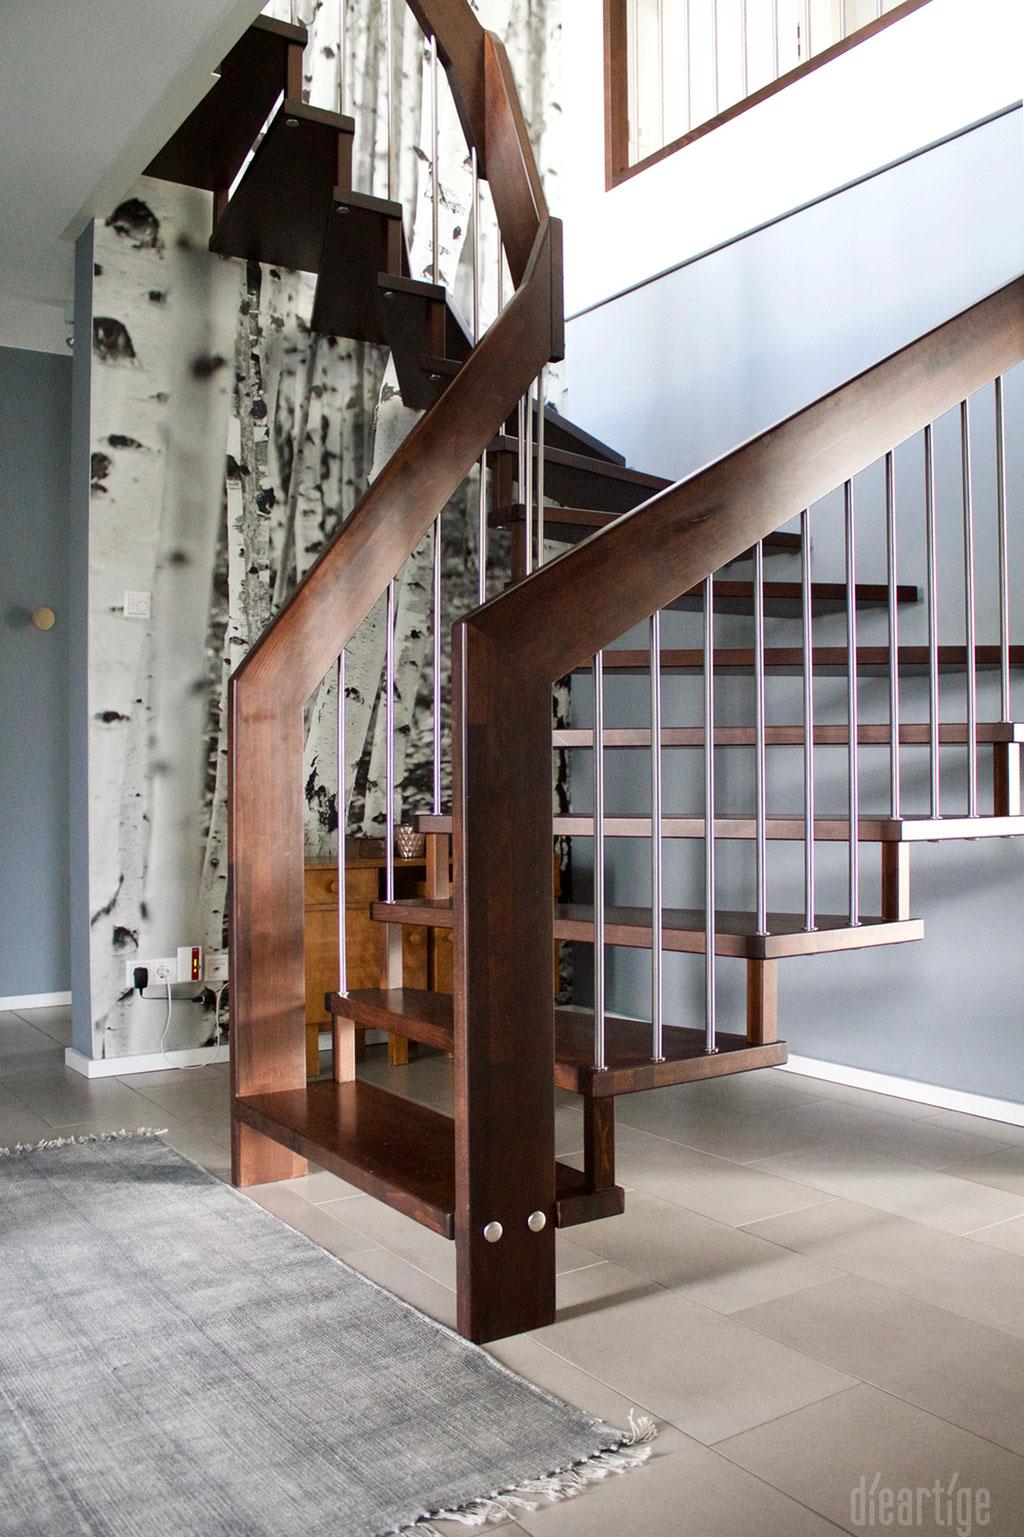 Fam. Z. | Treppe | Fototapete Birkenmotiv | Grauer Teppich | Graue Wand